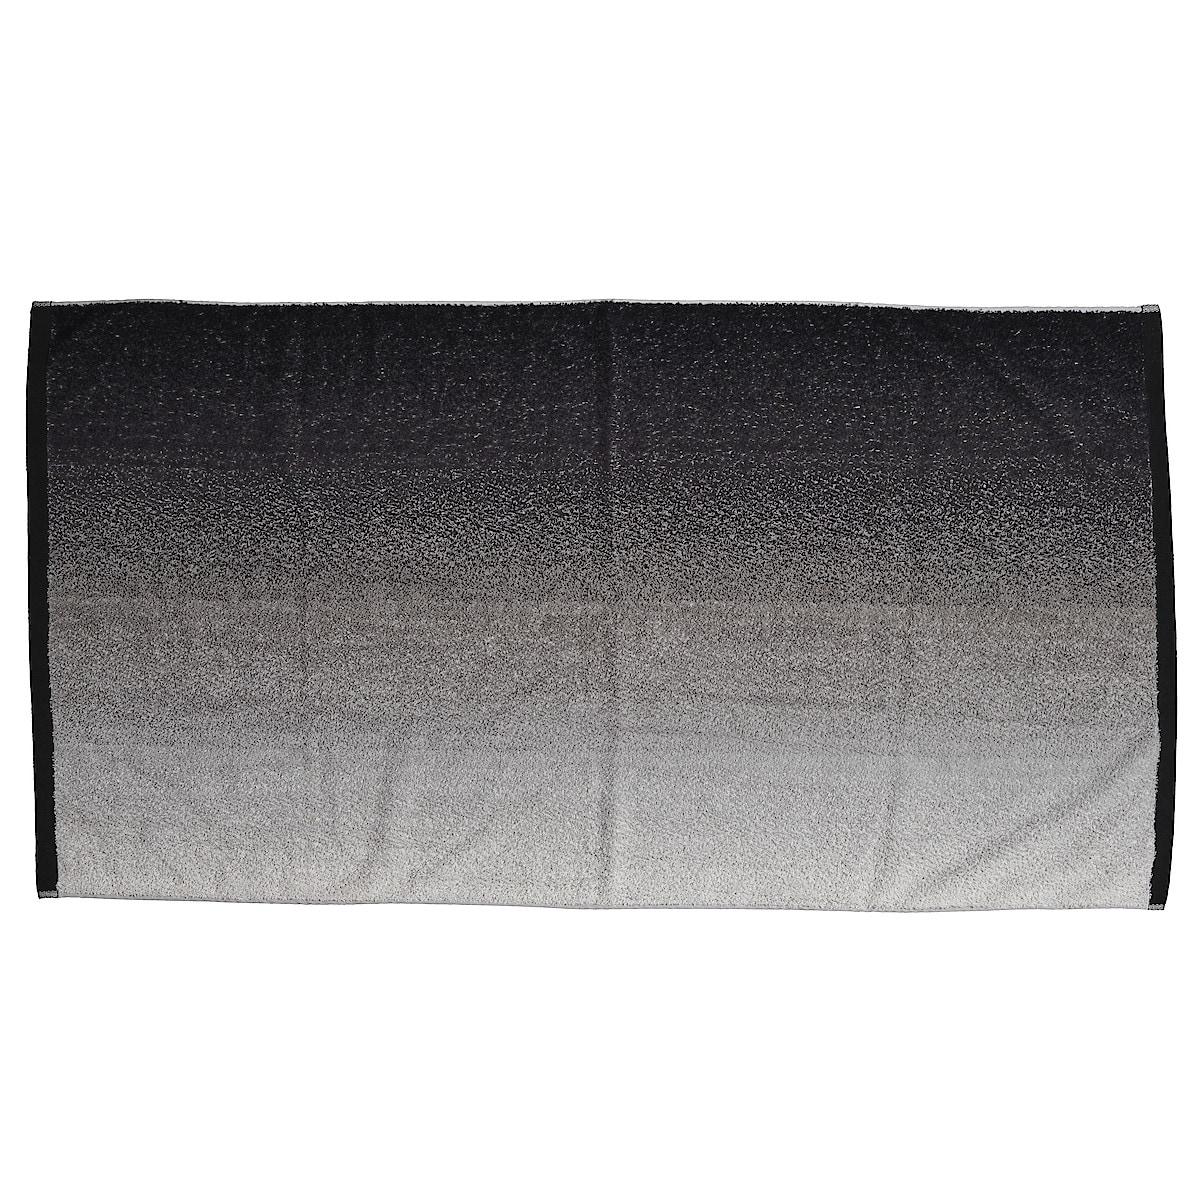 Dip-Dye Bath Towel